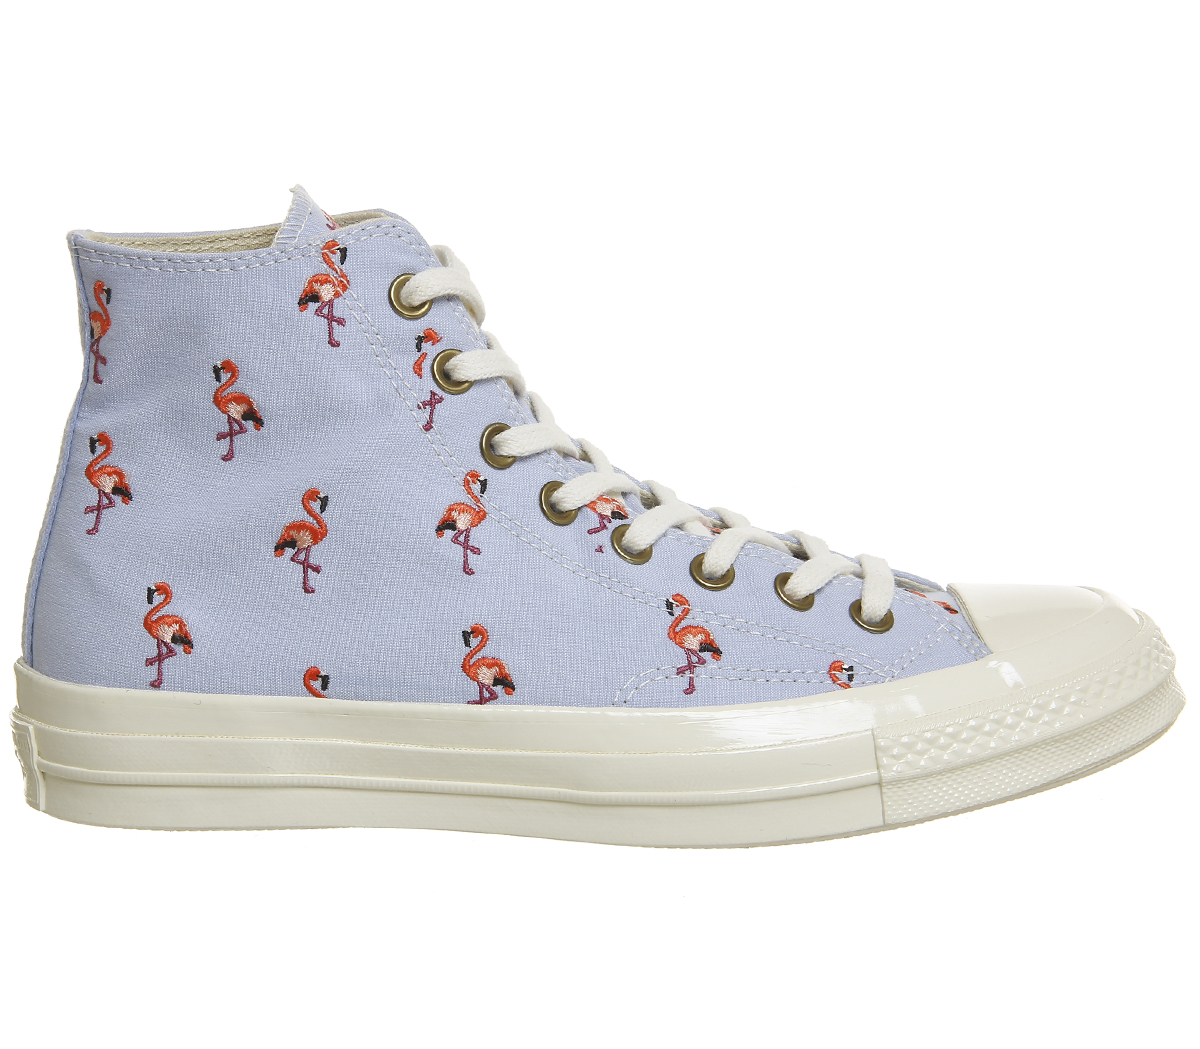 All Homme 70 Chaussures Années Bleu Converse Chill Hi Baskets Star rrqxRnwU